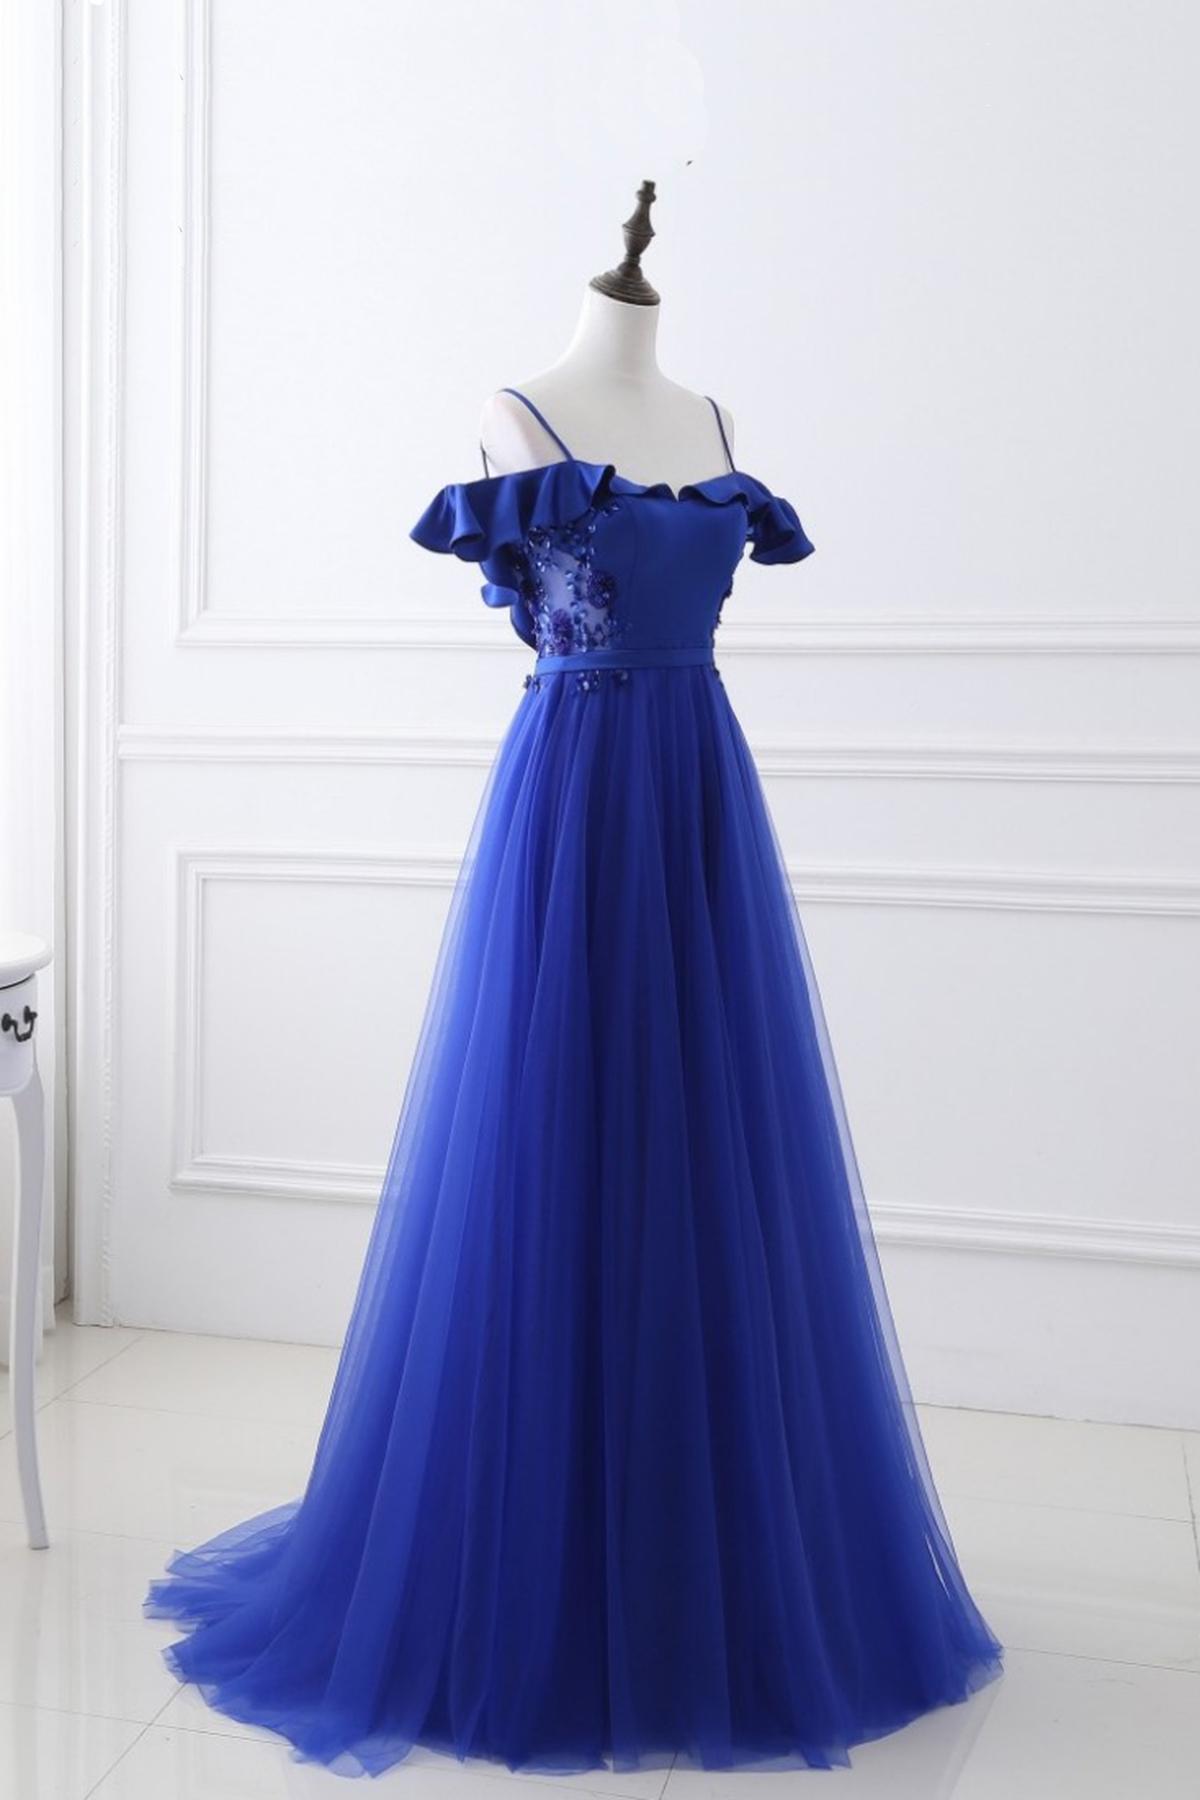 a75cd98ce42 Gorgeous spaghetti straps royal blue prom dresses 2017 tulle elegant evening  party dress vestido formatura longo